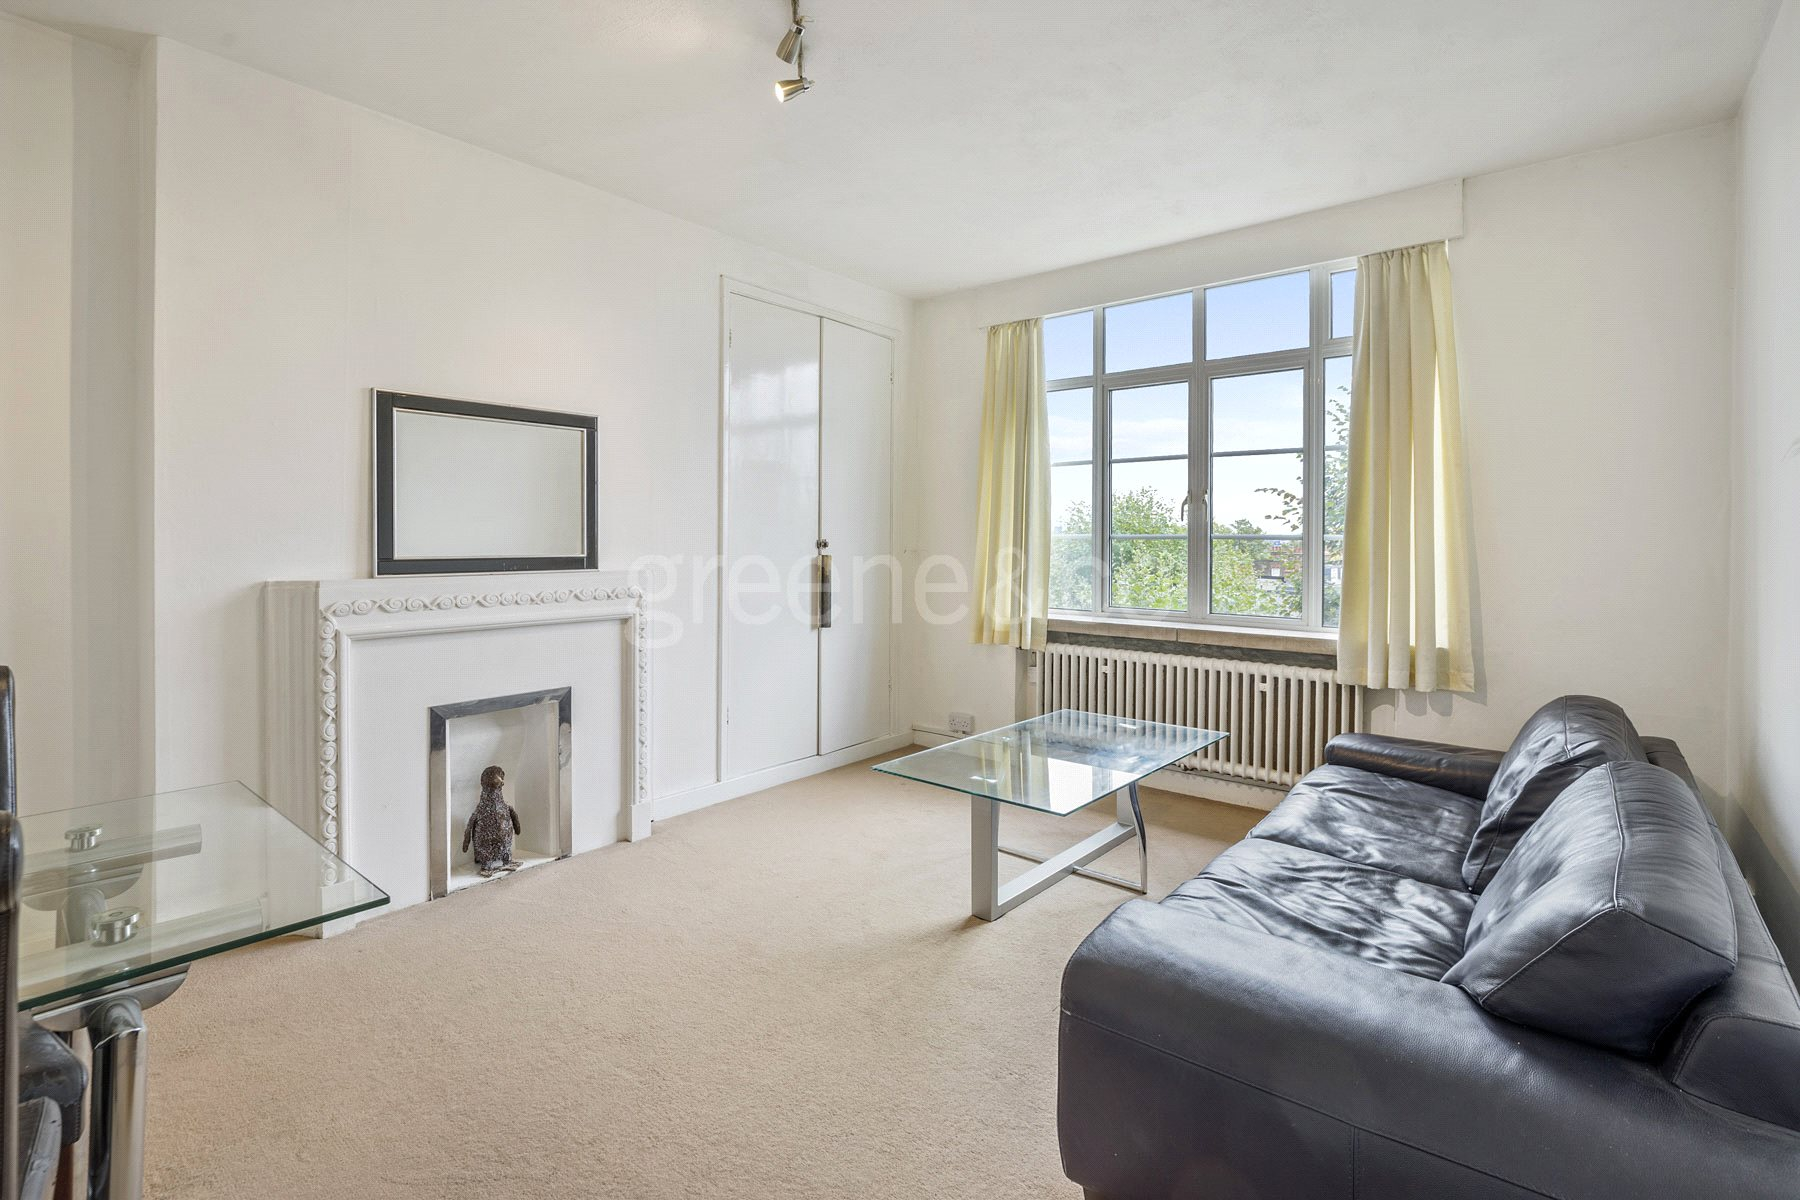 1 Bedroom Flat for sale in Tarranbrae, Kilburn, Willesden Lane, London, NW6